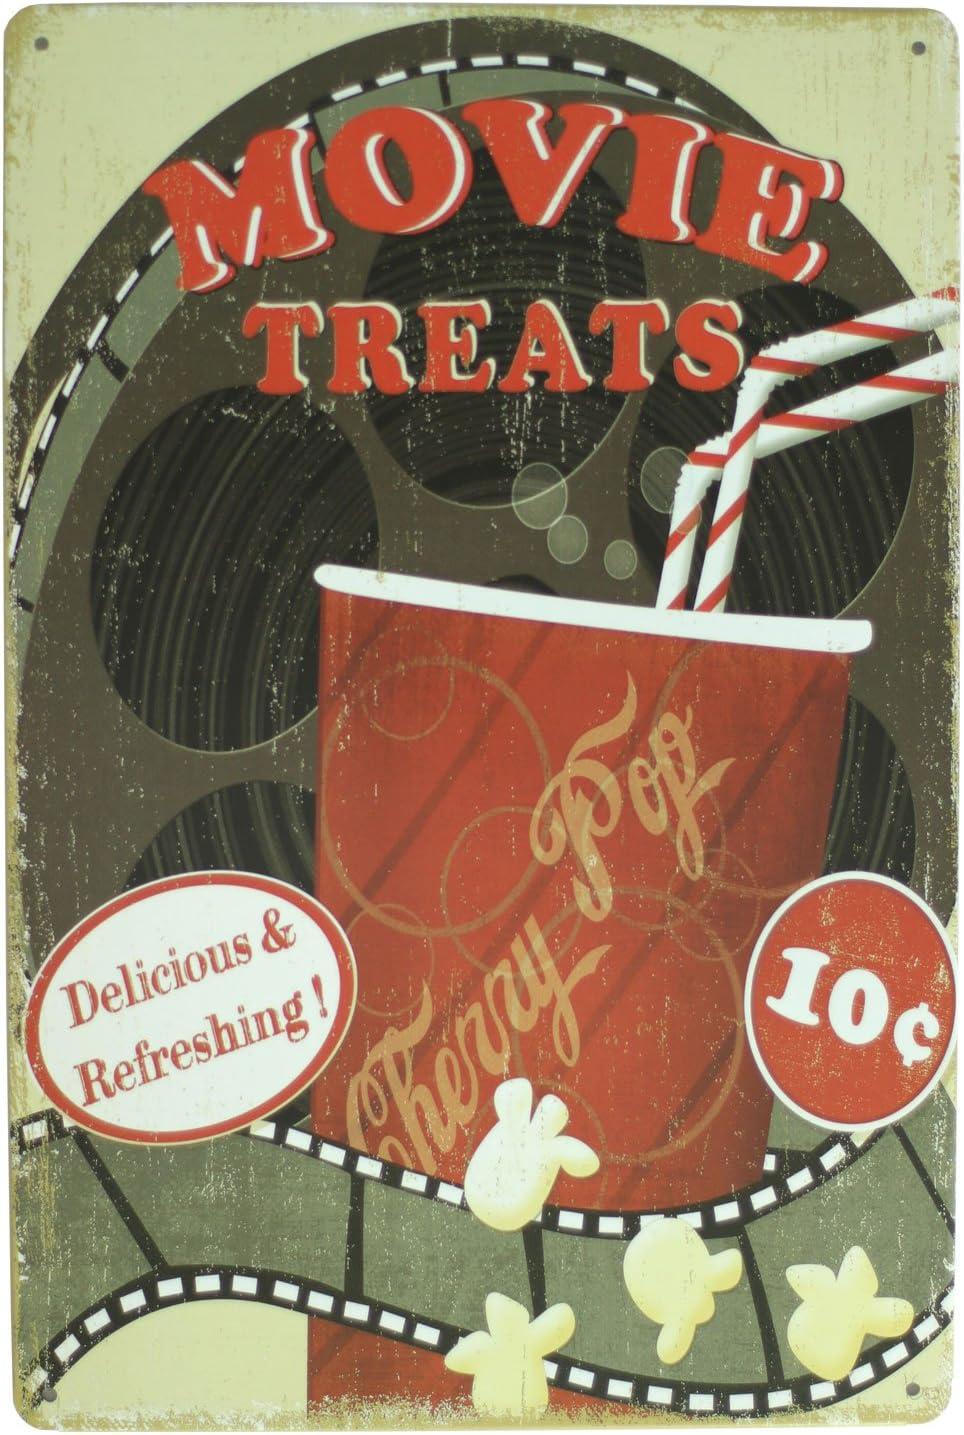 UOOPAI Movie Treats Popcorn Metal Sign Vintage Art Decor House Cinema Metal Plaque Wall Poster